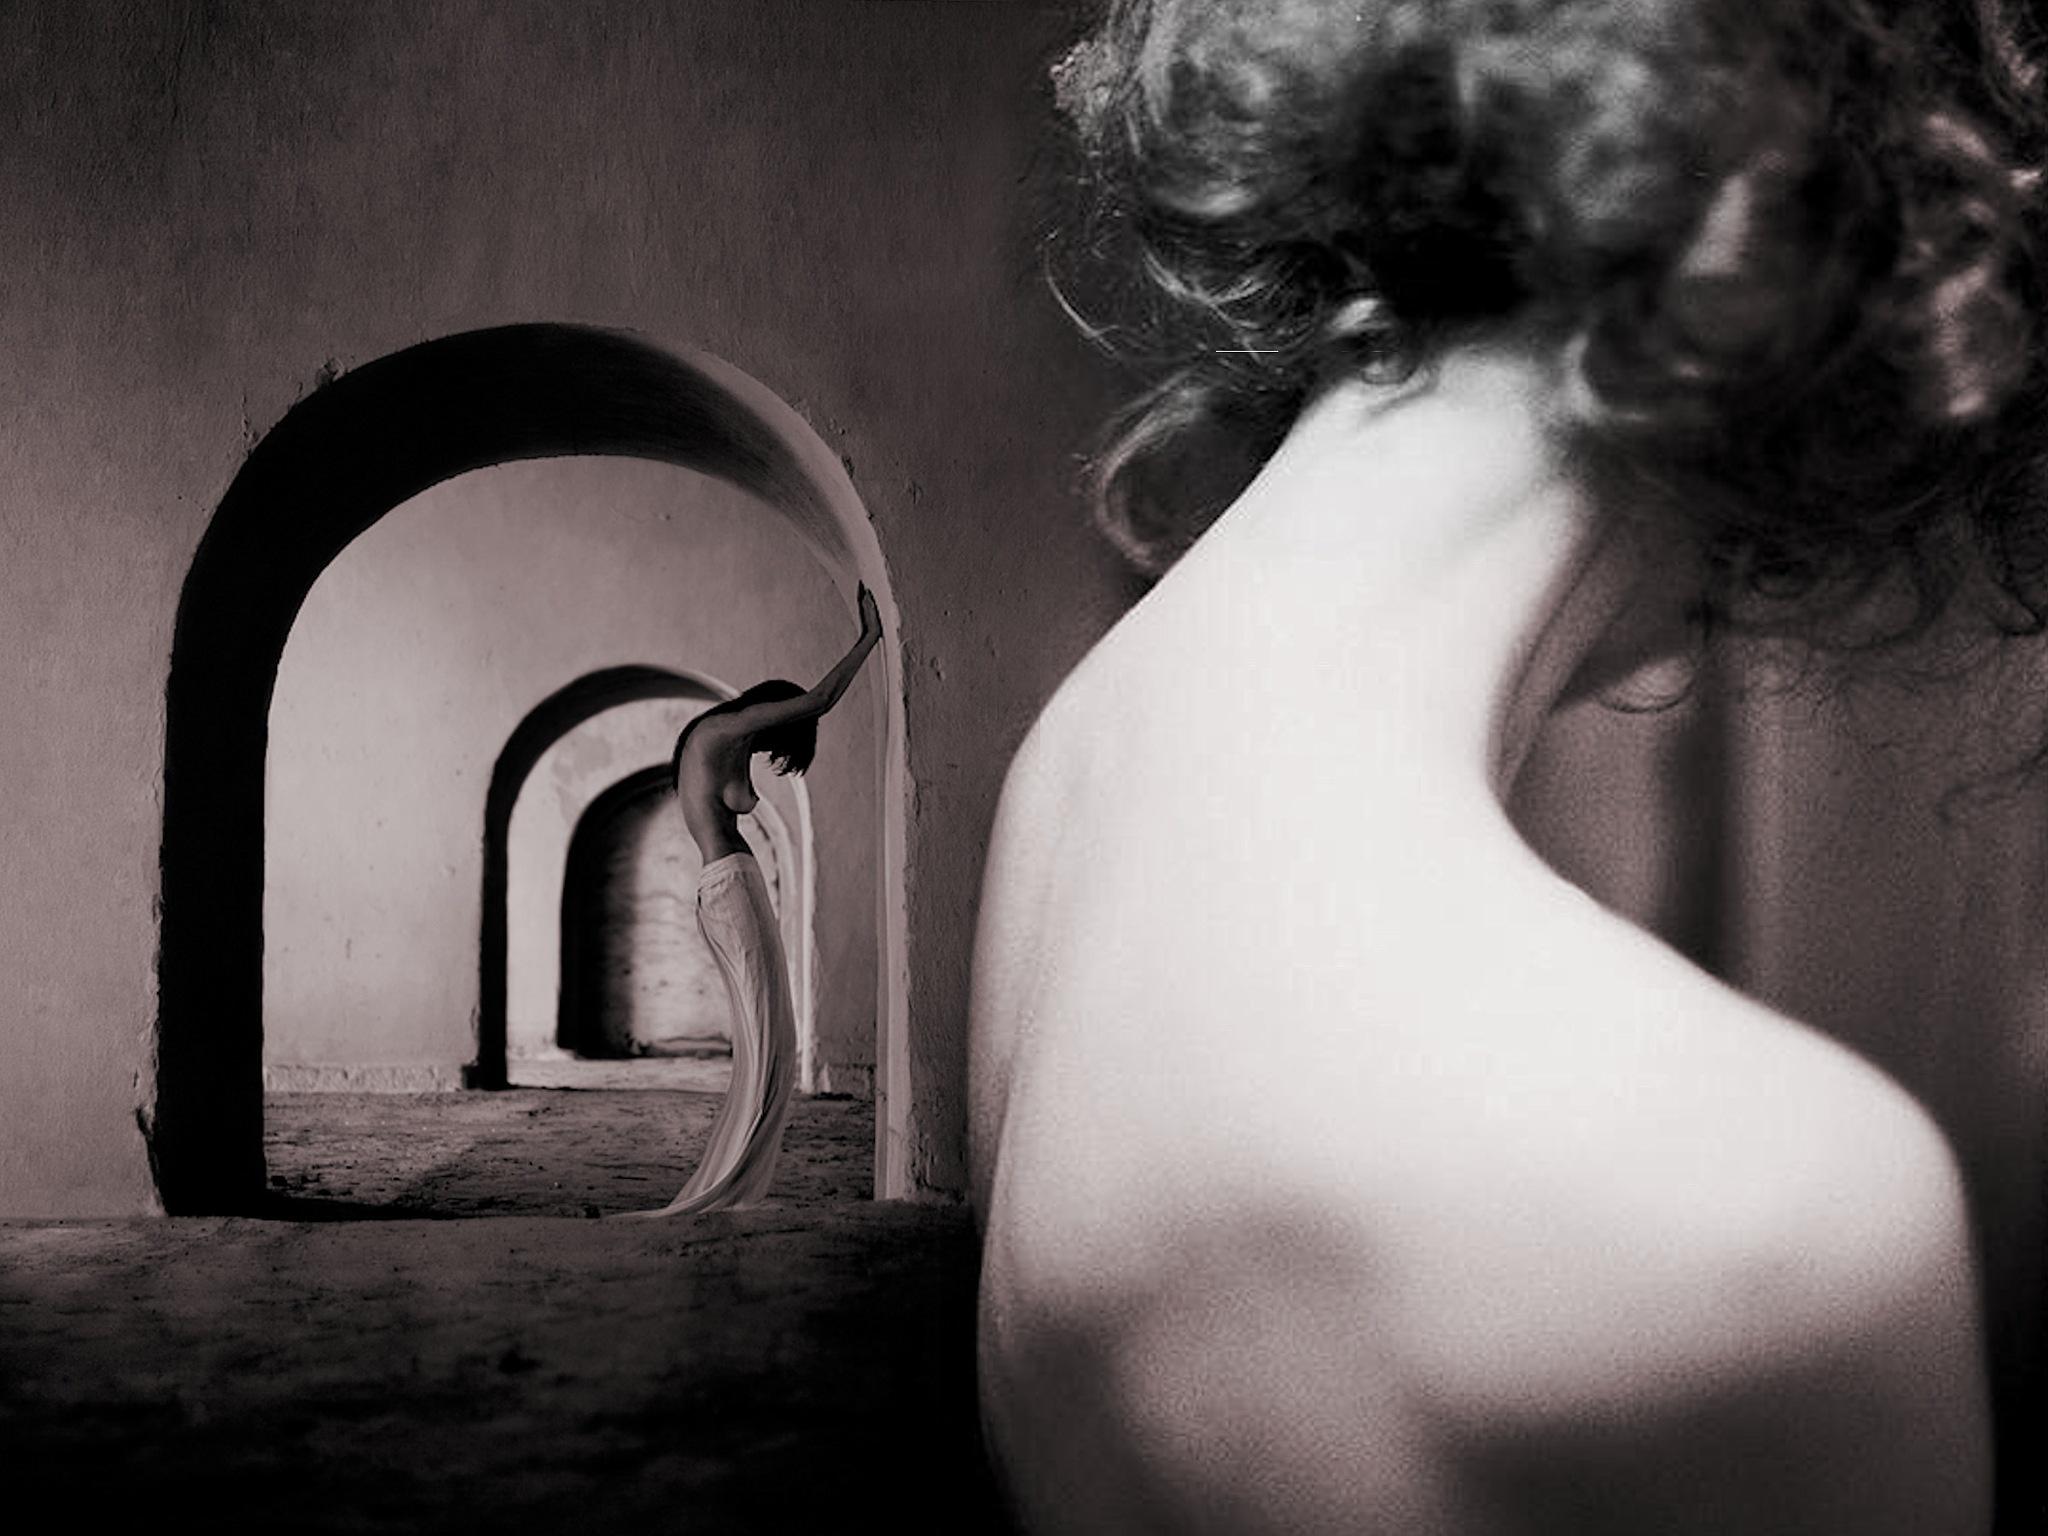 A Separation II by Alexandros Raskolnick